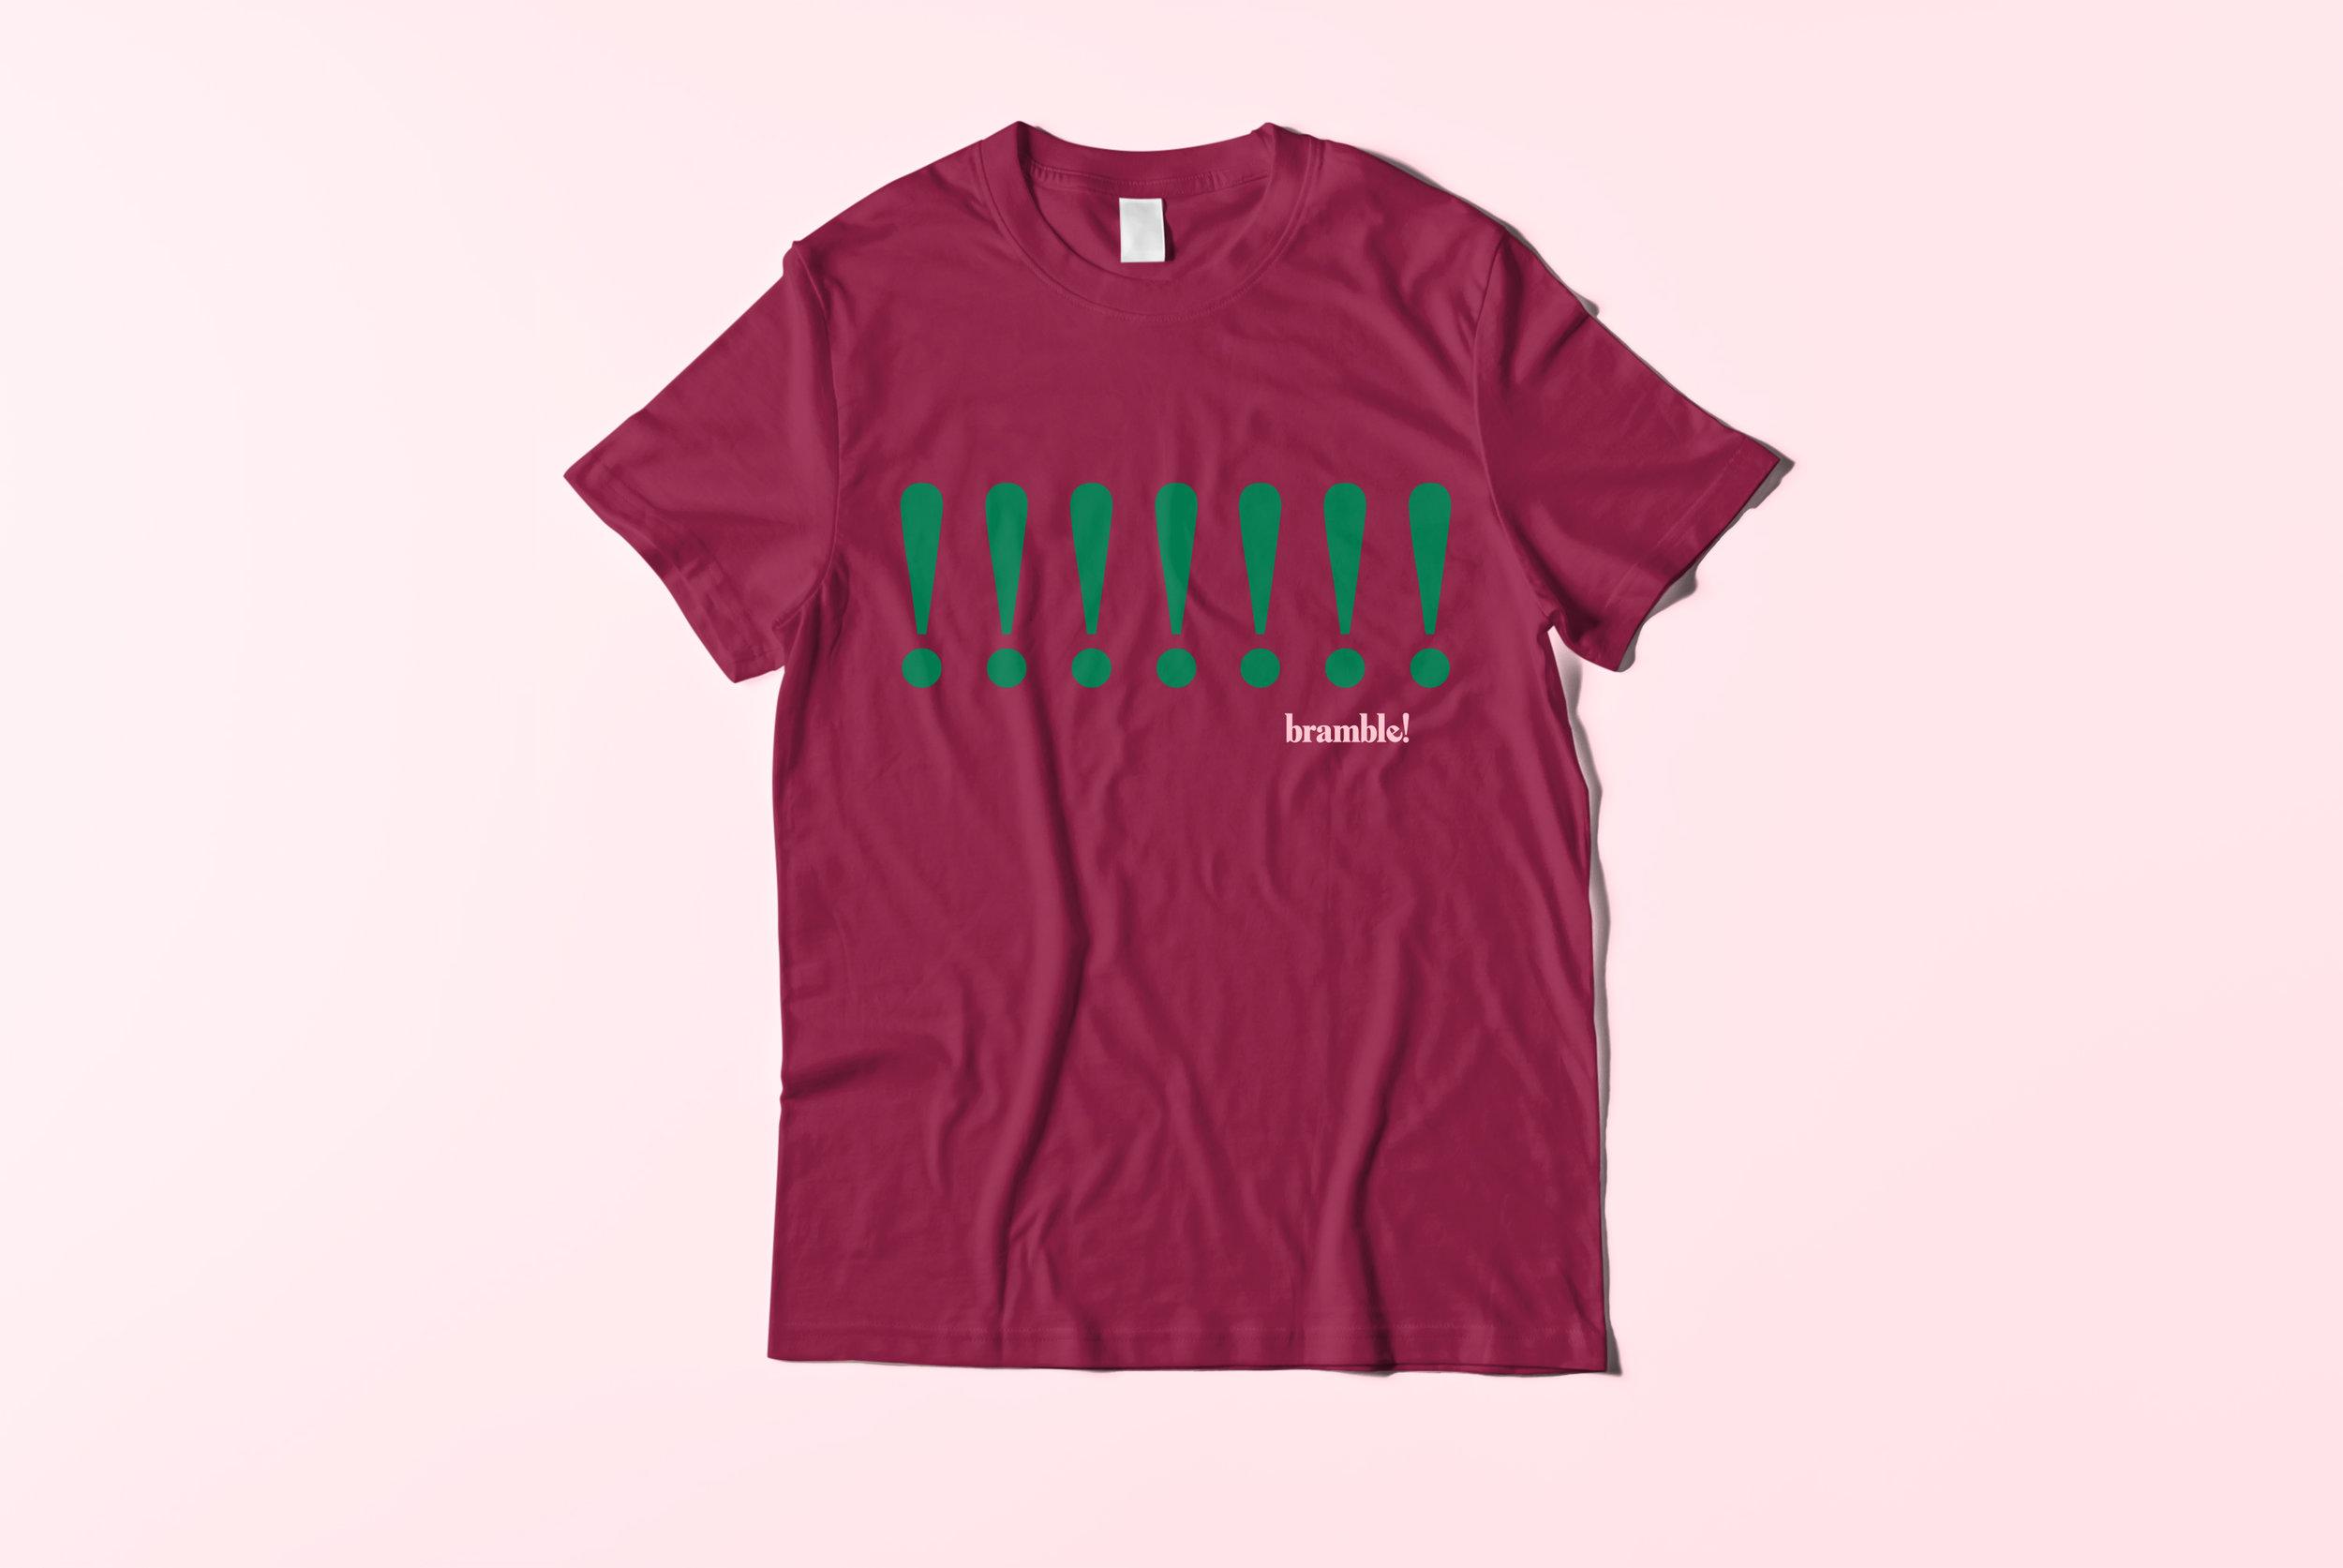 T-Shirt Mockup_guys.jpg